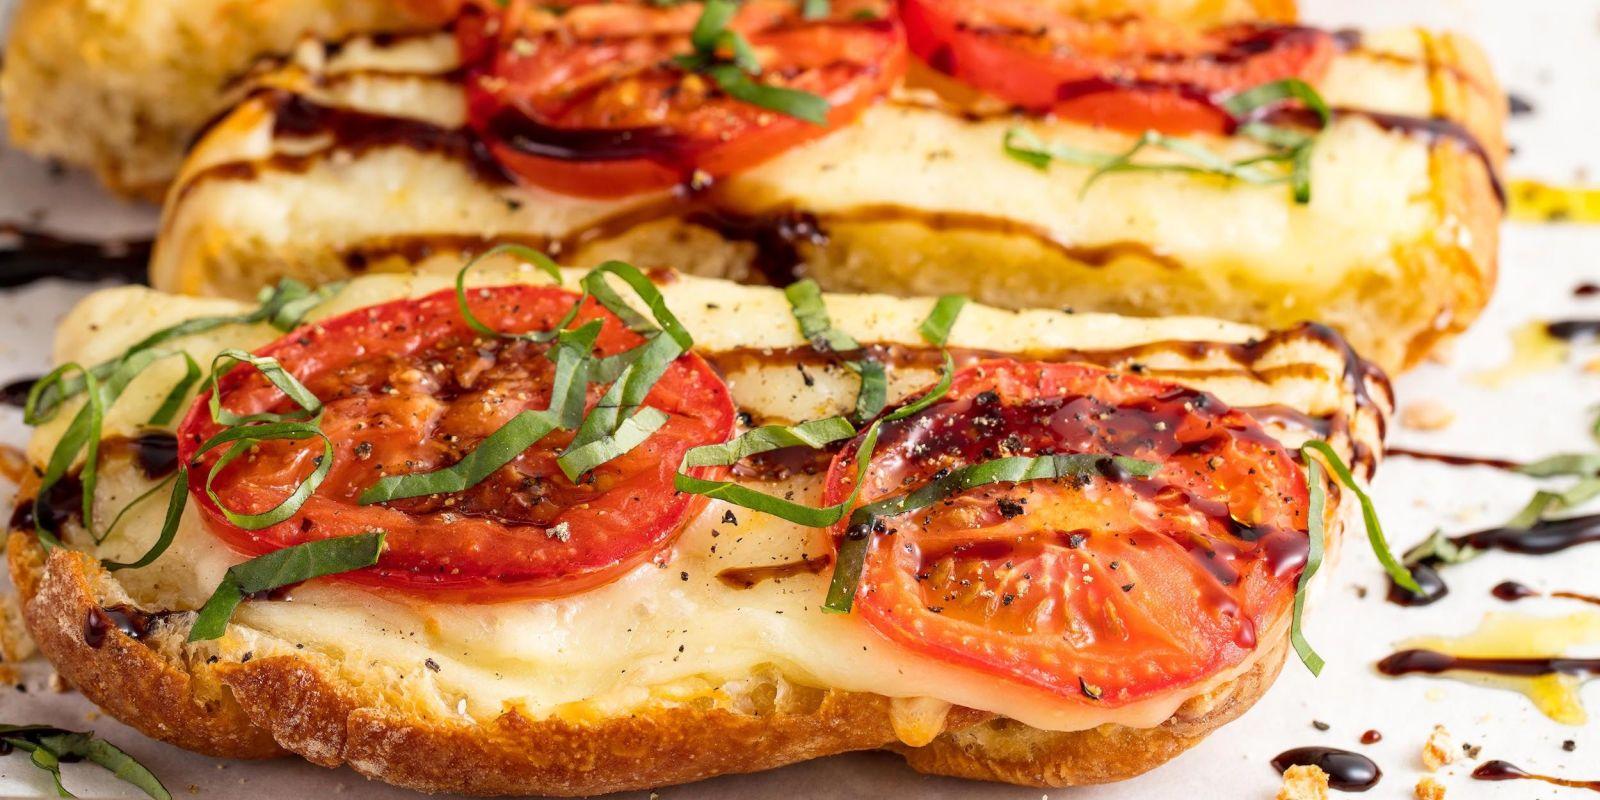 Best Caprese Garlic Bread Recipe How To Make Caprese Garlic Bread Delish Com